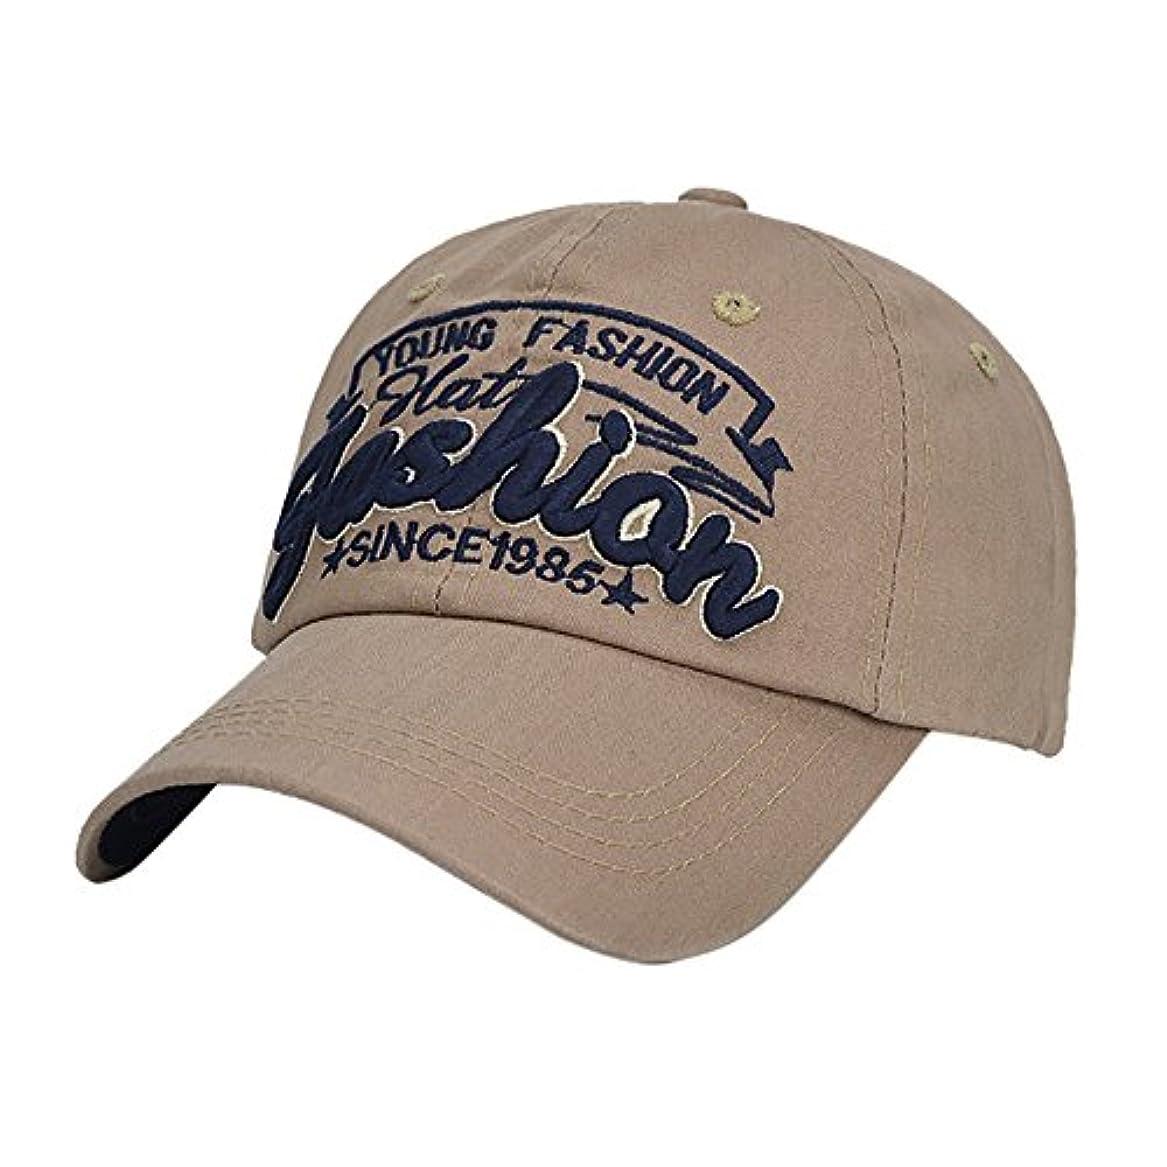 Racazing Cap ヒップホップ 野球帽 ストリートダンス 夏 登山 通気性のある 帽子 パール ビーディング 可調整可能 日焼け止め 棒球帽 UV 帽子 軽量 屋外 女性向 Hat (コーヒー)